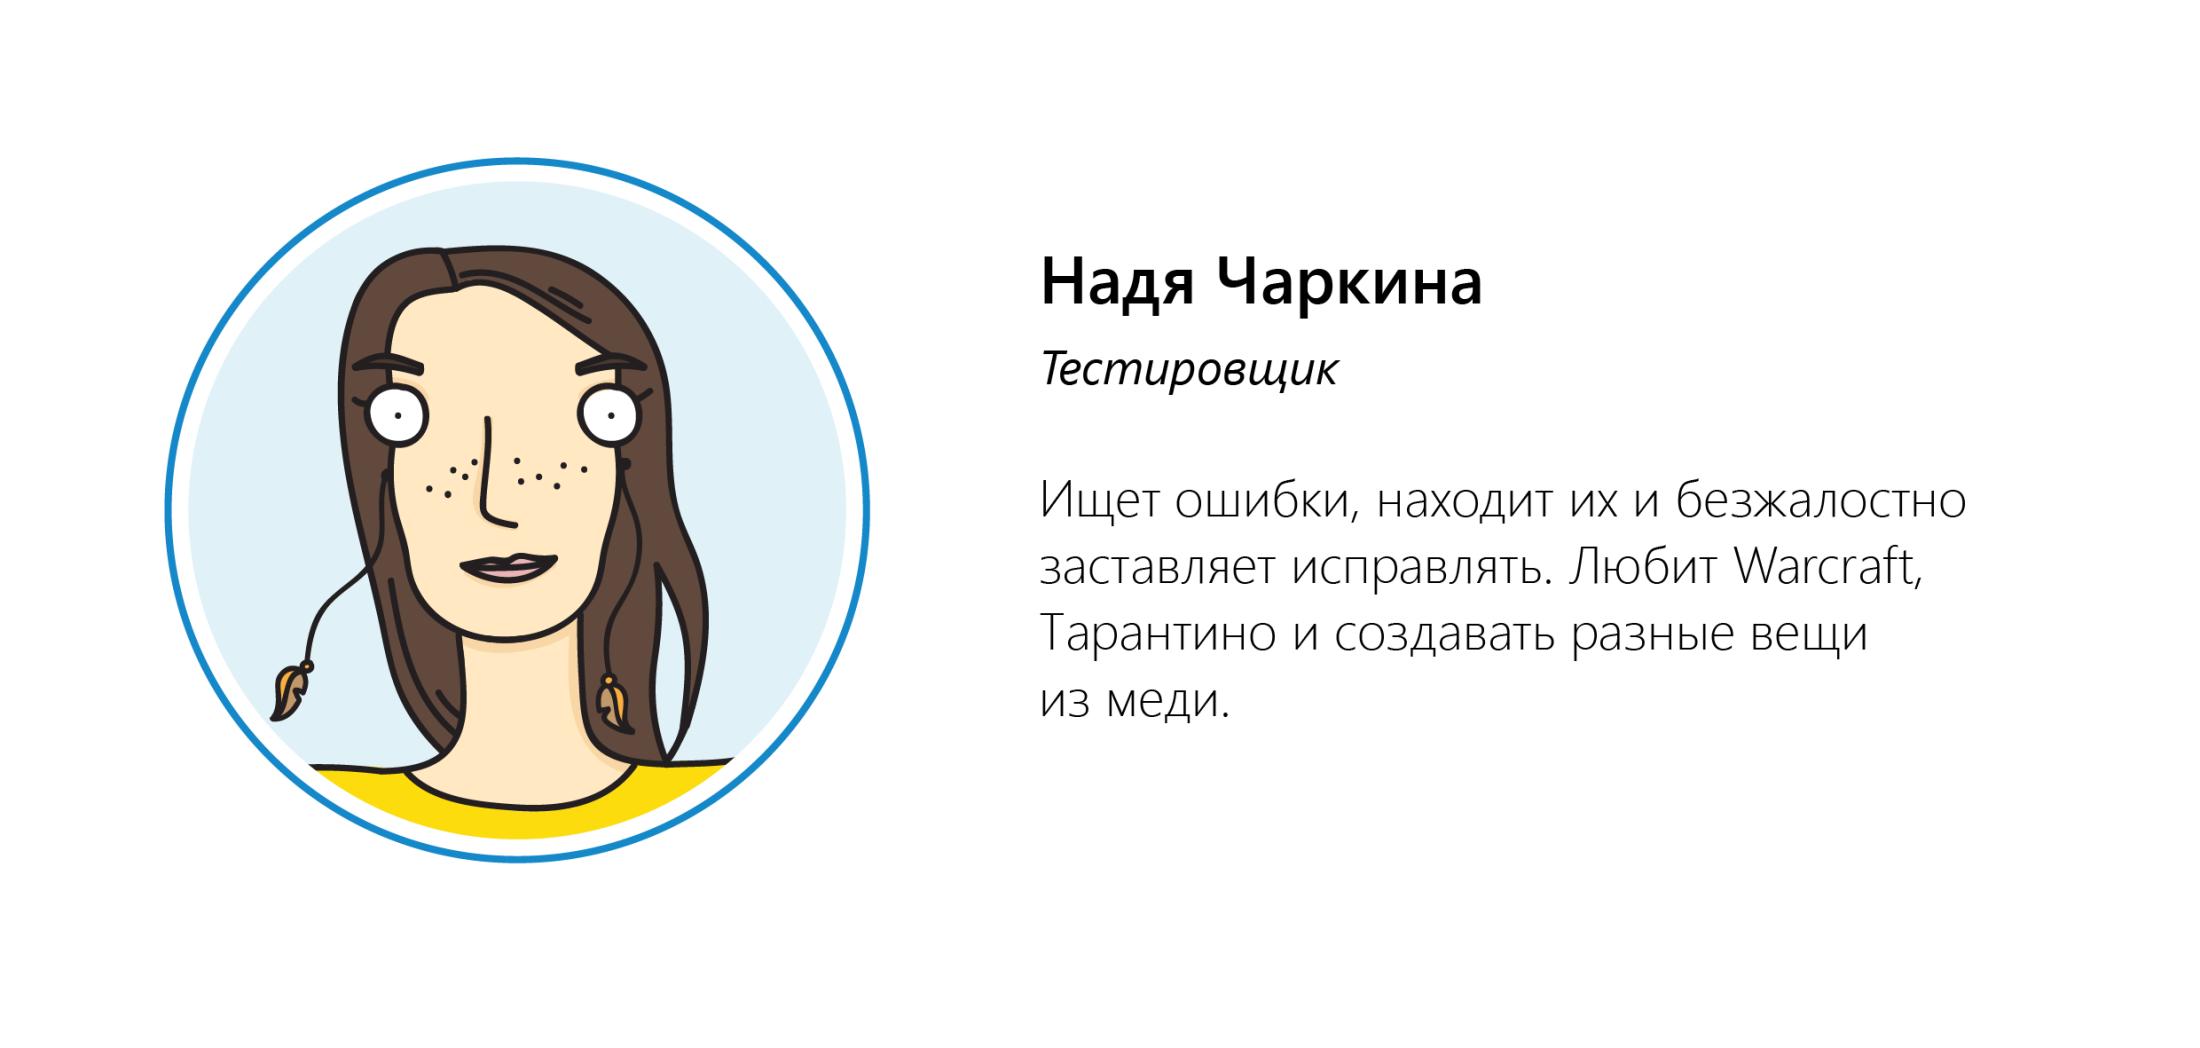 Надя Чаркина